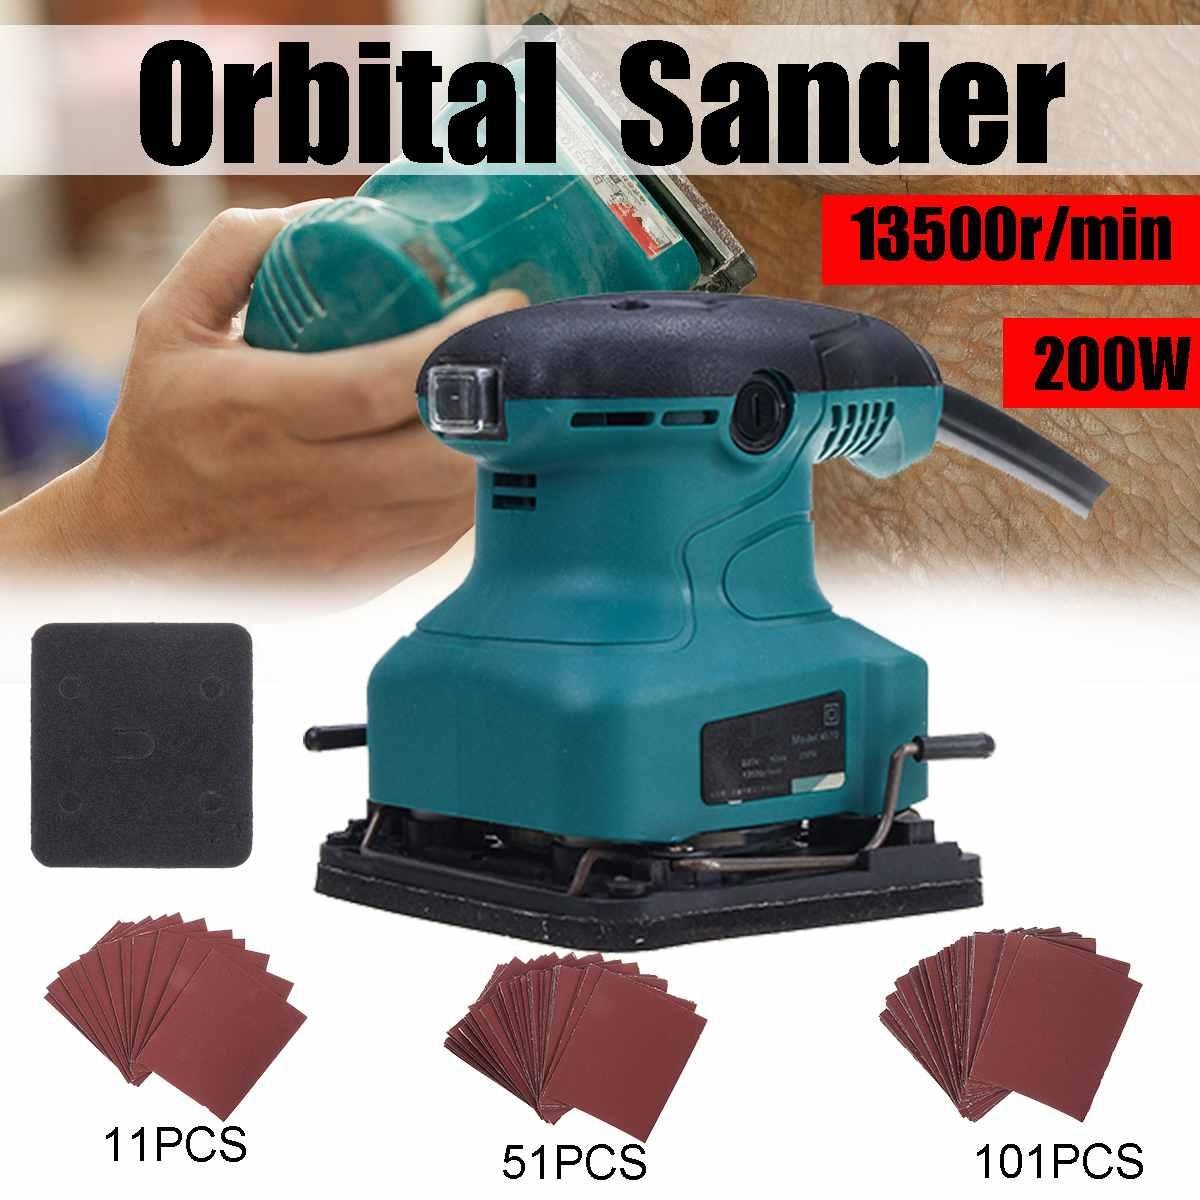 200W 220V Electric Sander Machine Wood Orbital Sanding Polisher Furniture Metal Polishing Grinding Machine 101Pcs Sandpapers